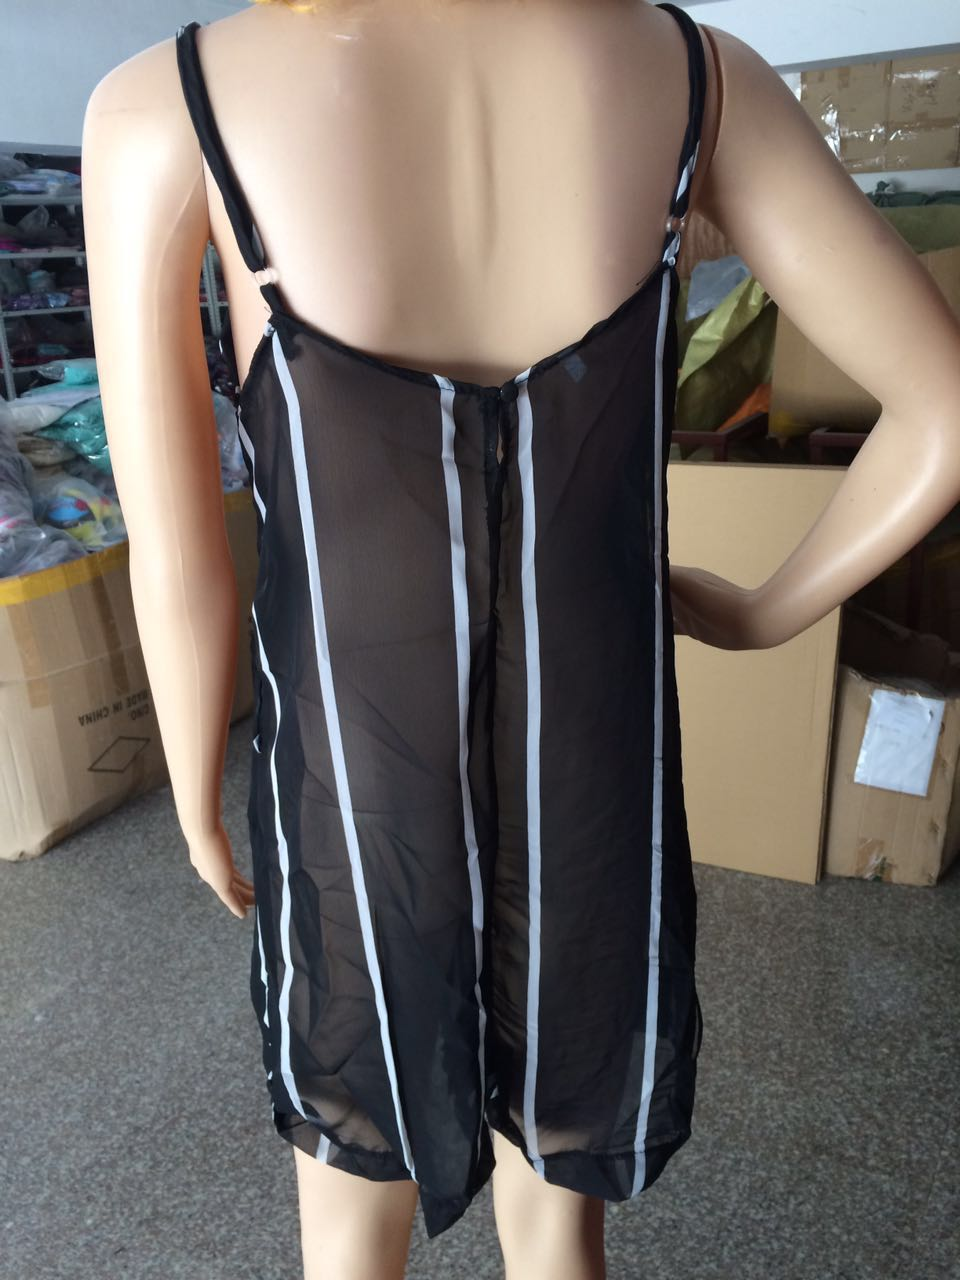 HTB1QamhgEl7MKJjSZFDq6yOEpXae - FREE SHIPPING  Summer Women Casual Striped Jumpsuit JKP301